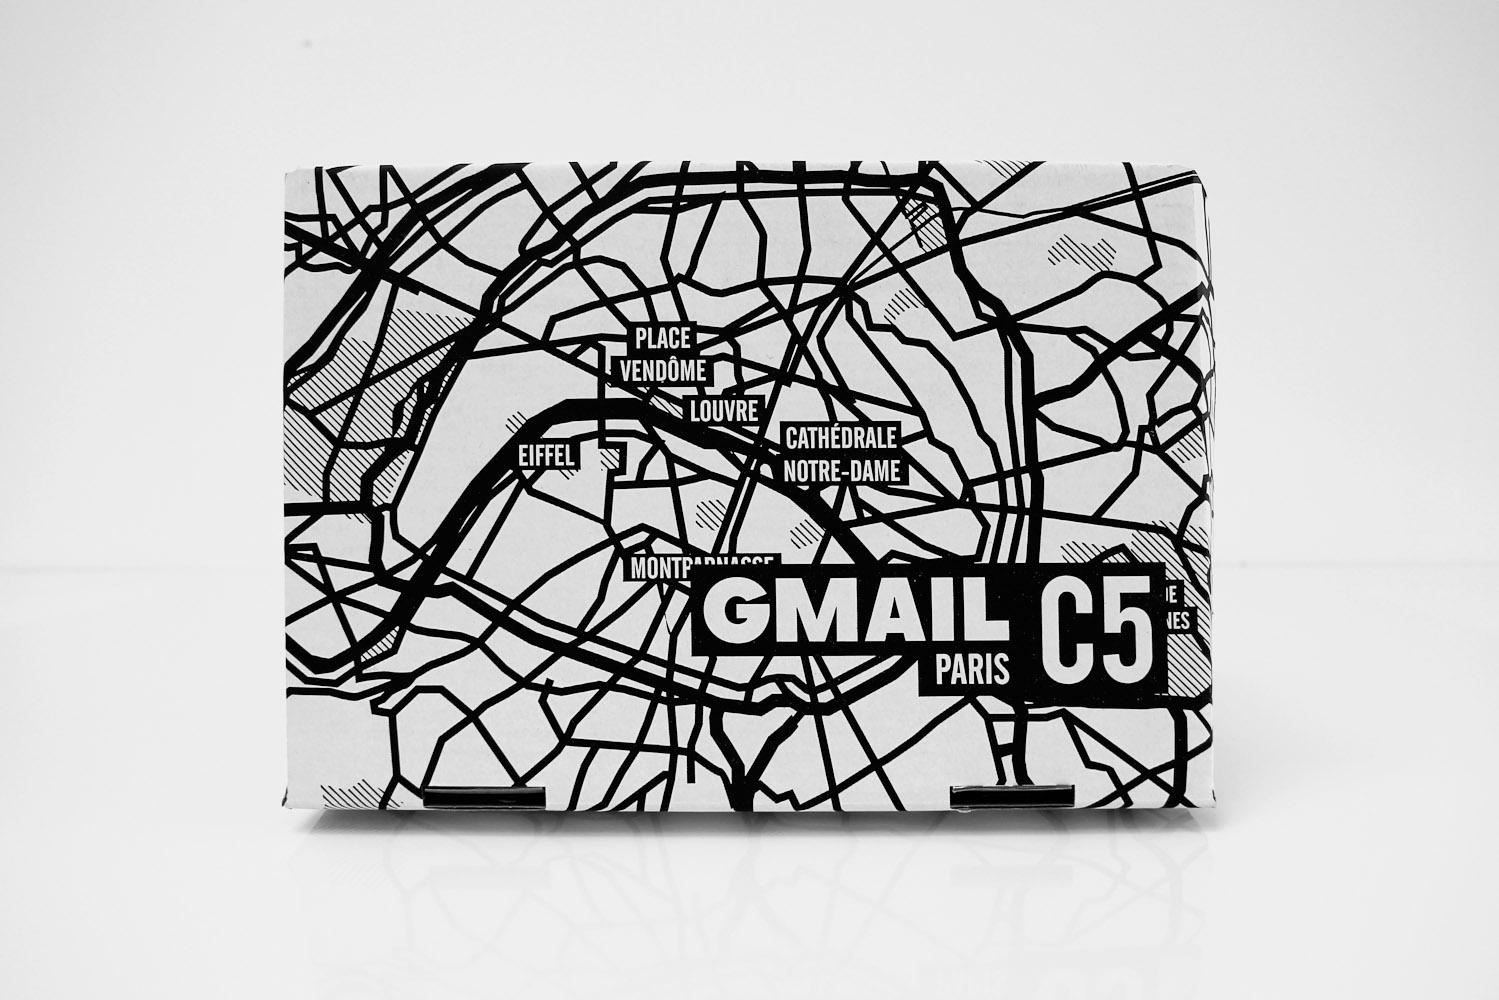 GMAIL_projekt roku w kat opakowania_STGU_03_fot.sokka